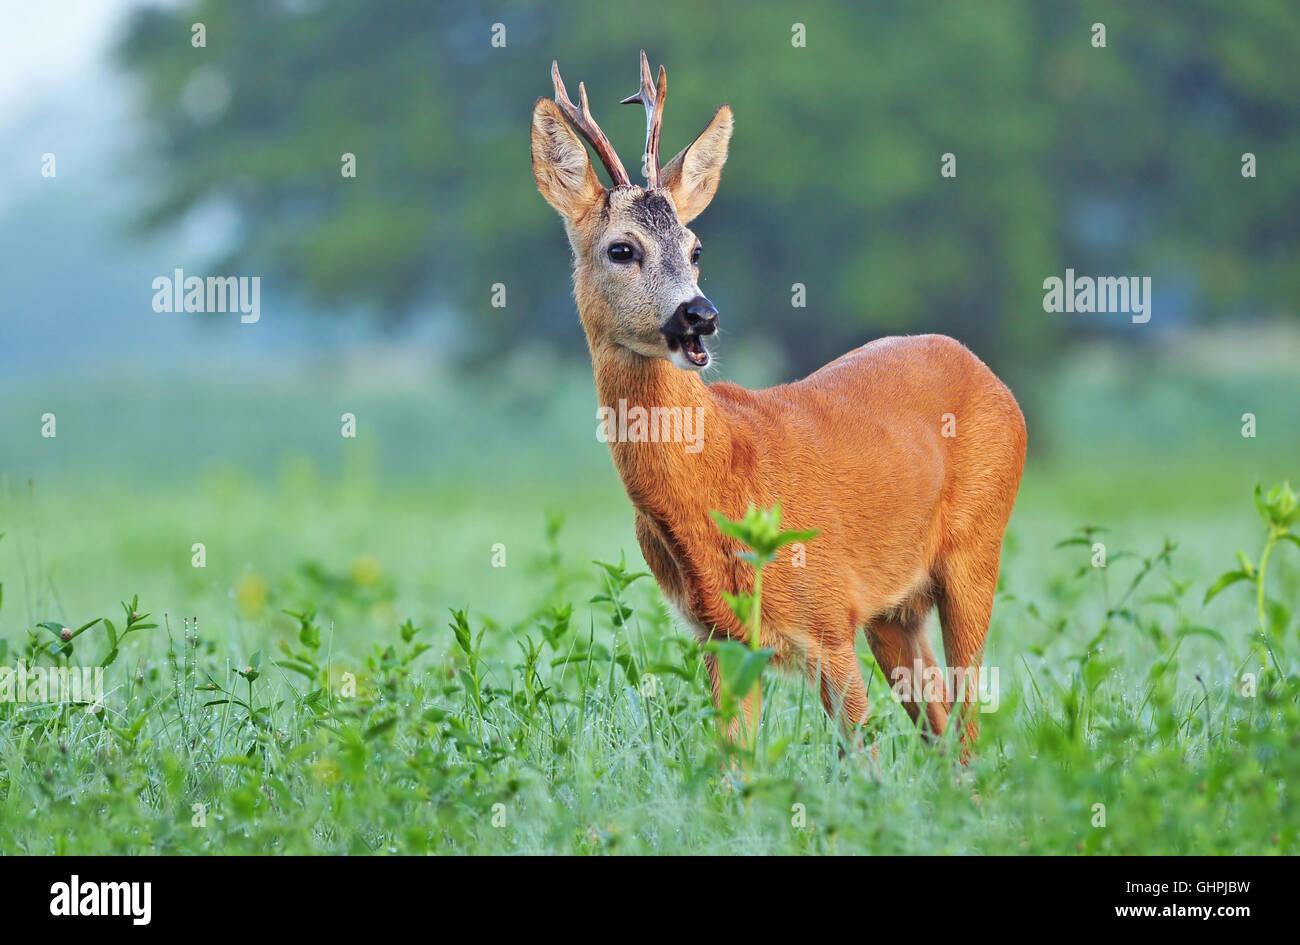 Wilde Rehe (Capreolus Capreolus) stehen in einem Feld Stockfoto